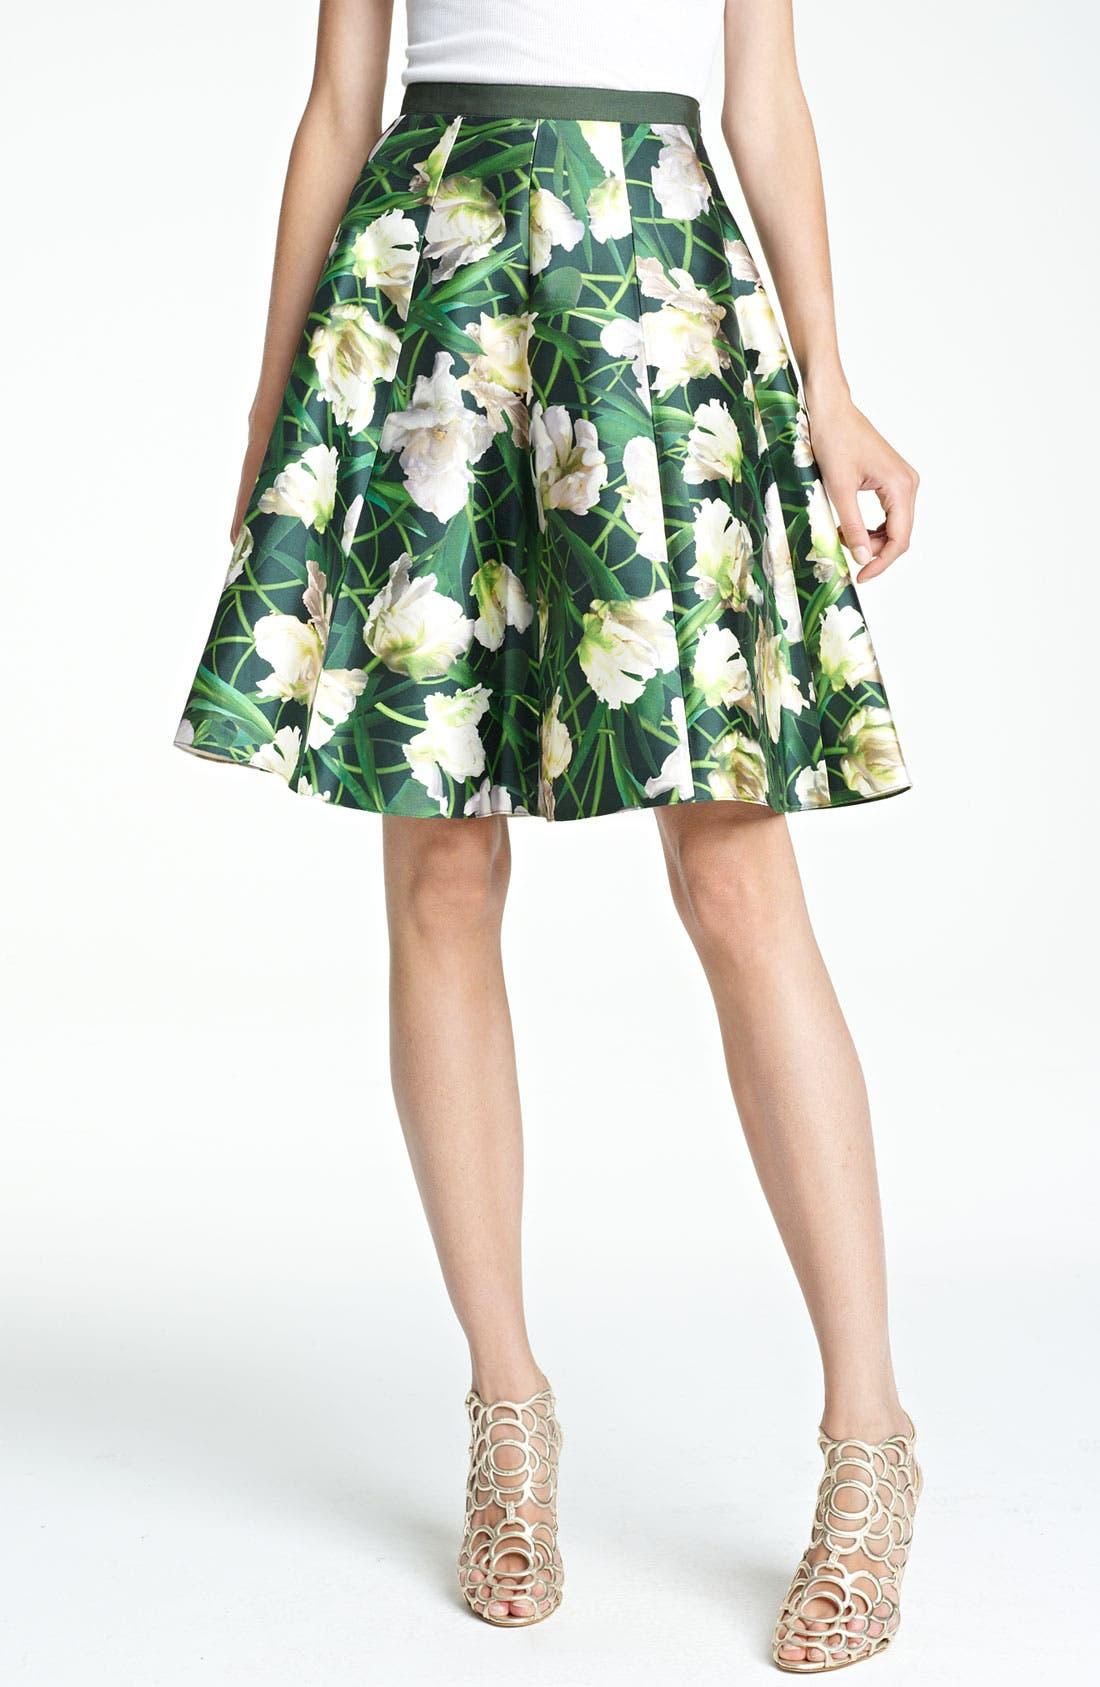 Alternate Image 1 Selected - Oscar de la Renta Floral Print Swing Skirt